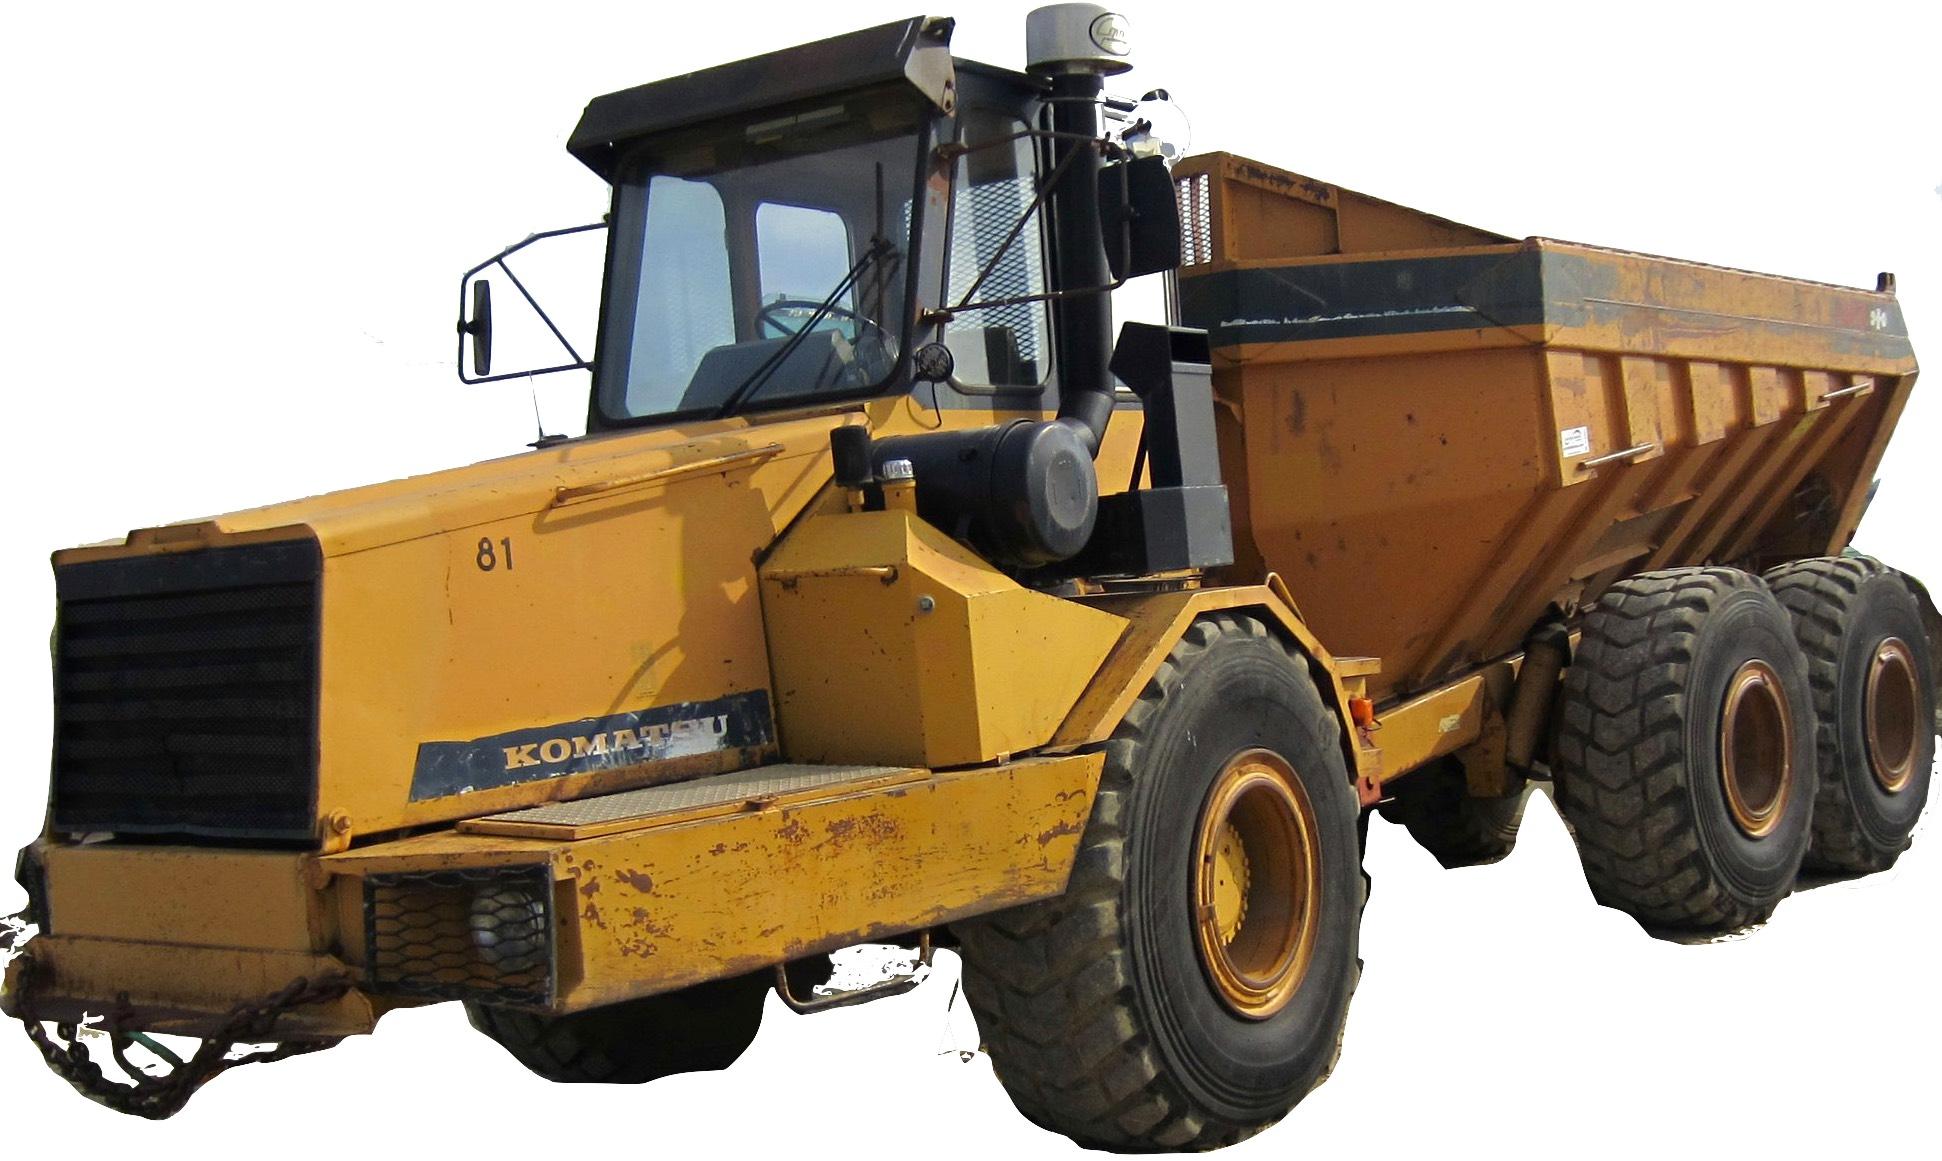 Komatsu Articulated Dump Truck HA250, HA270 Factory Service & Shop Manual